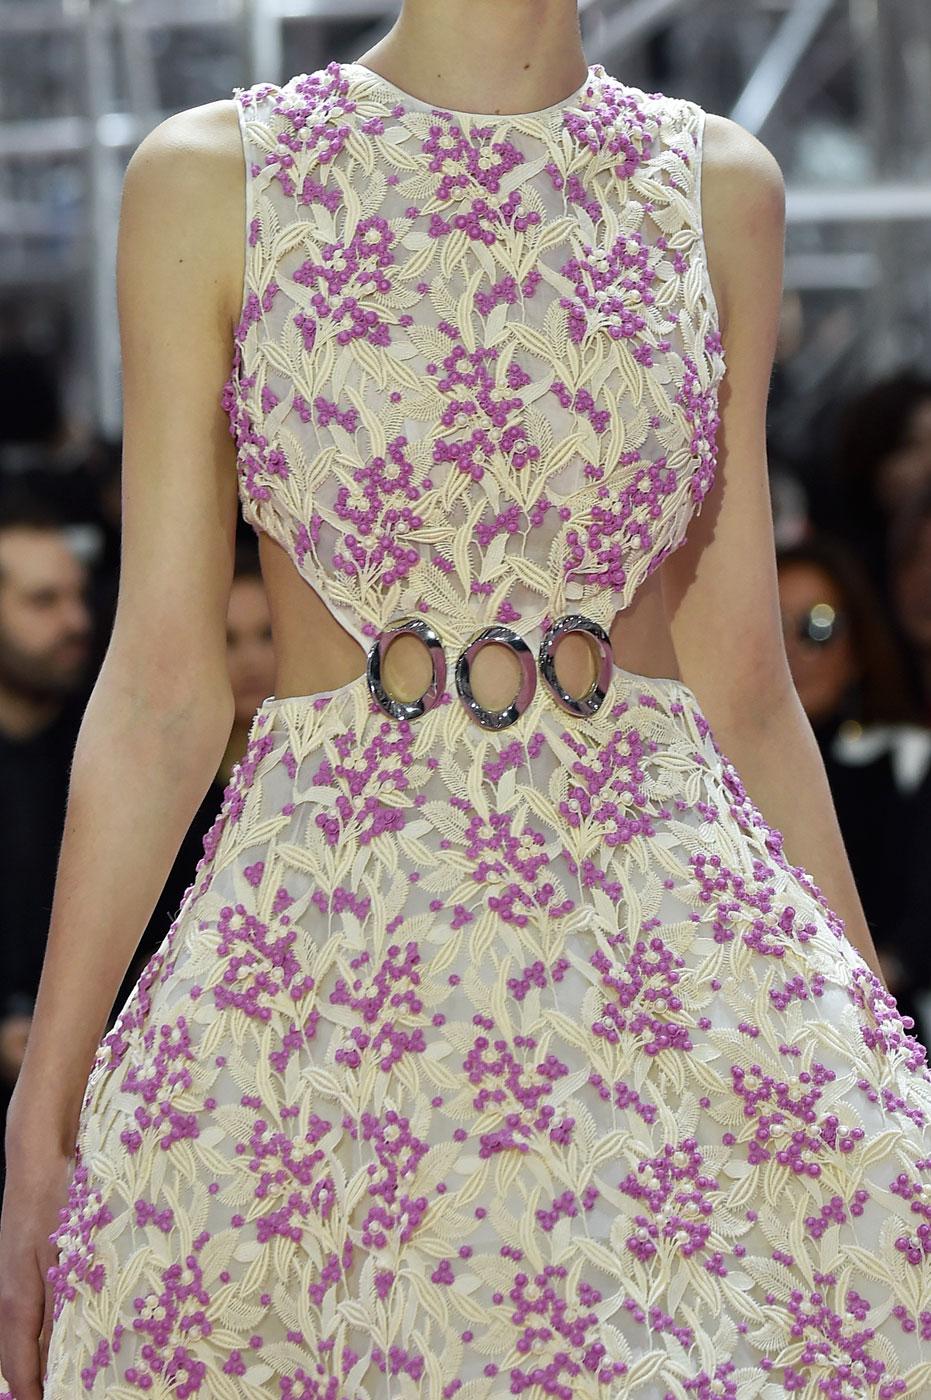 Christian-Dior-fashion-runway-show-close-ups-haute-couture-paris-spring-summer-2015-the-impression-057